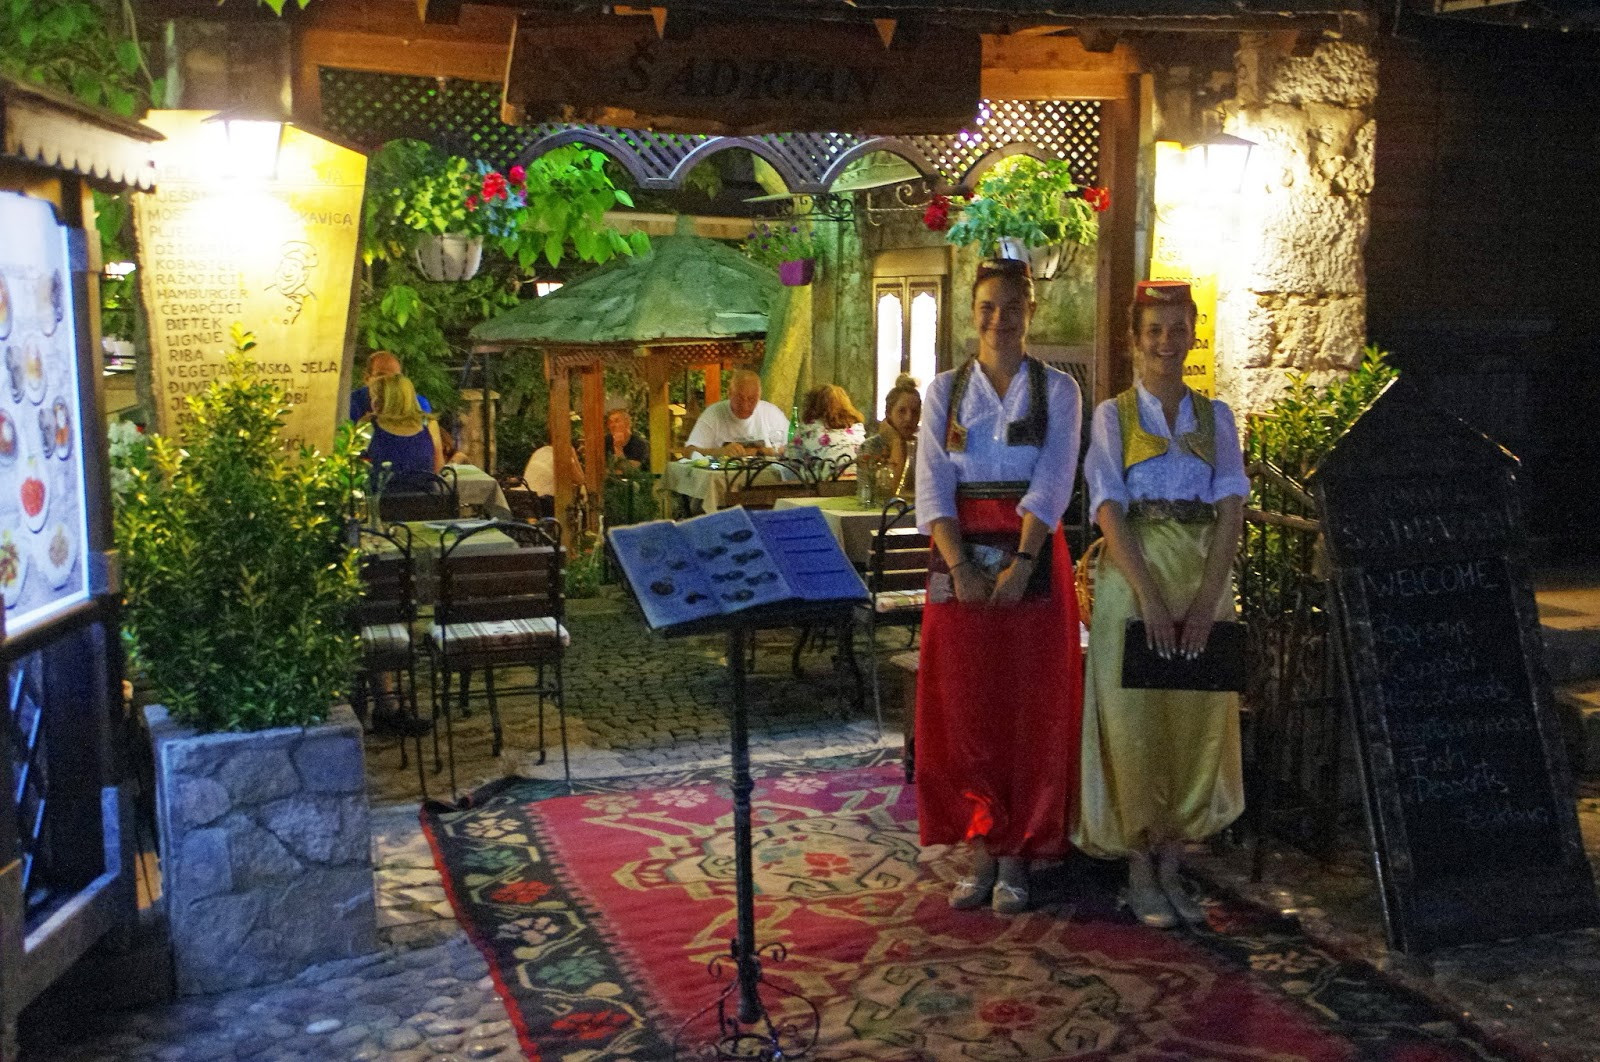 Traditional Bosnian cuisine in Mostar